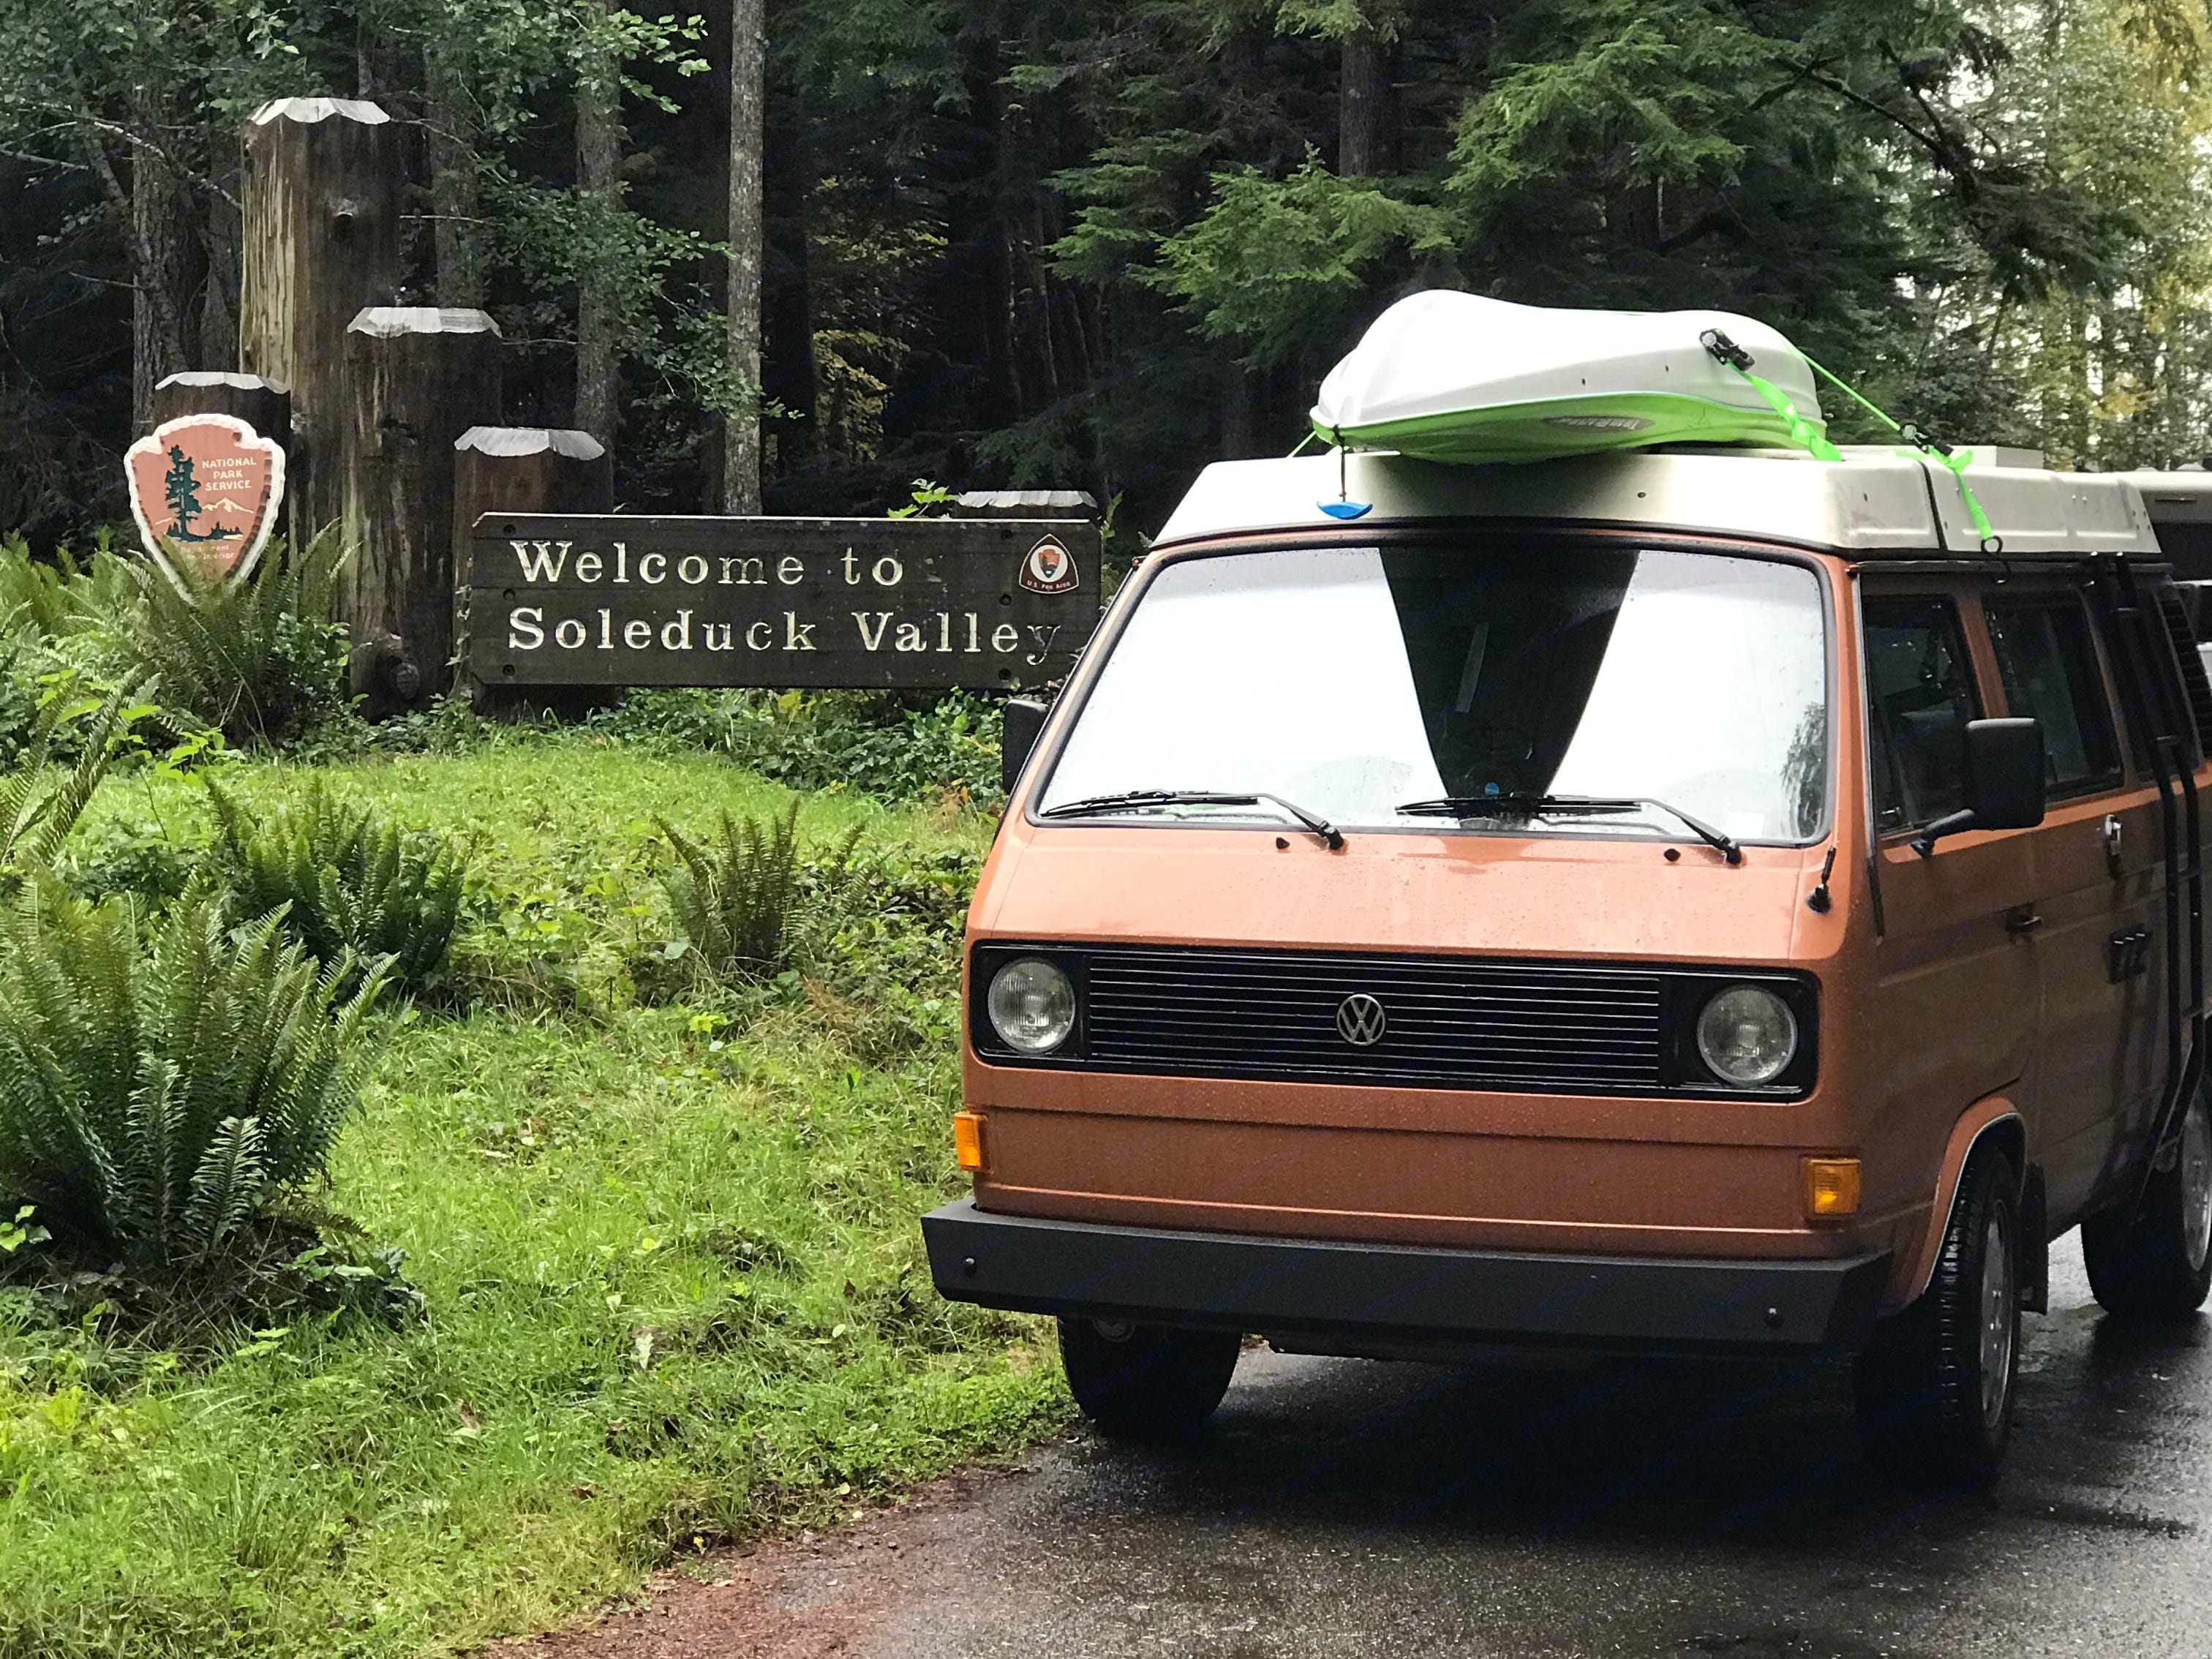 Dundee can take you on your next hiking, kayaking or fishing trip! . Volkswagen Westfalia 1982